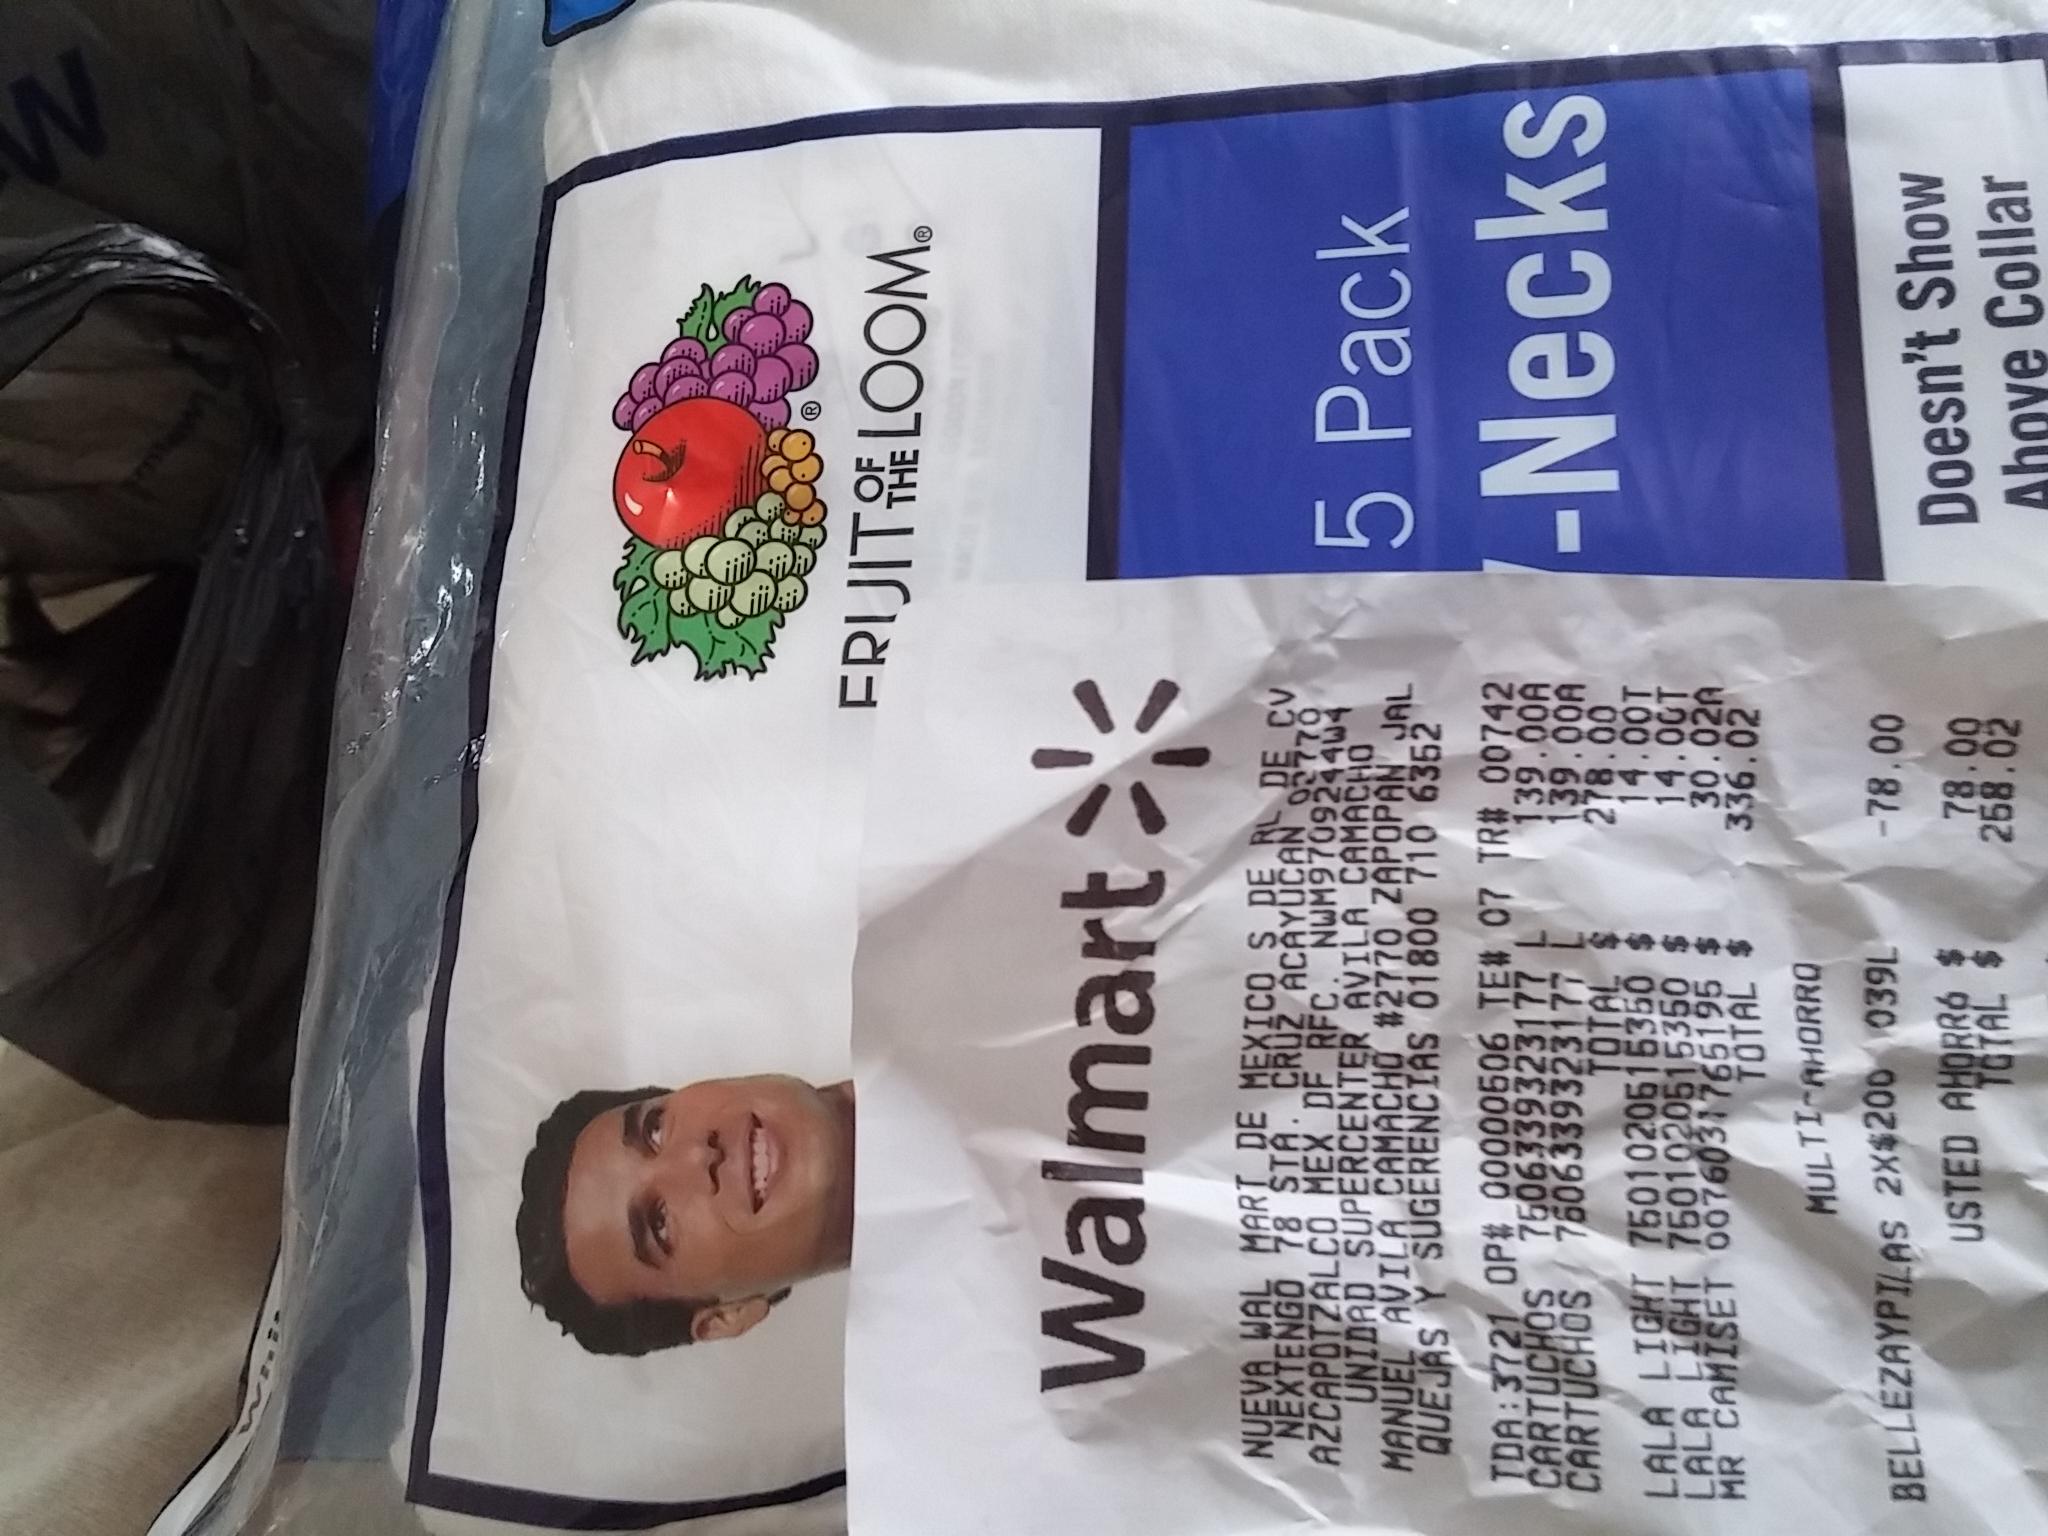 Walmart: 5 Pack Camiseta blanca de cuello V a $30.02